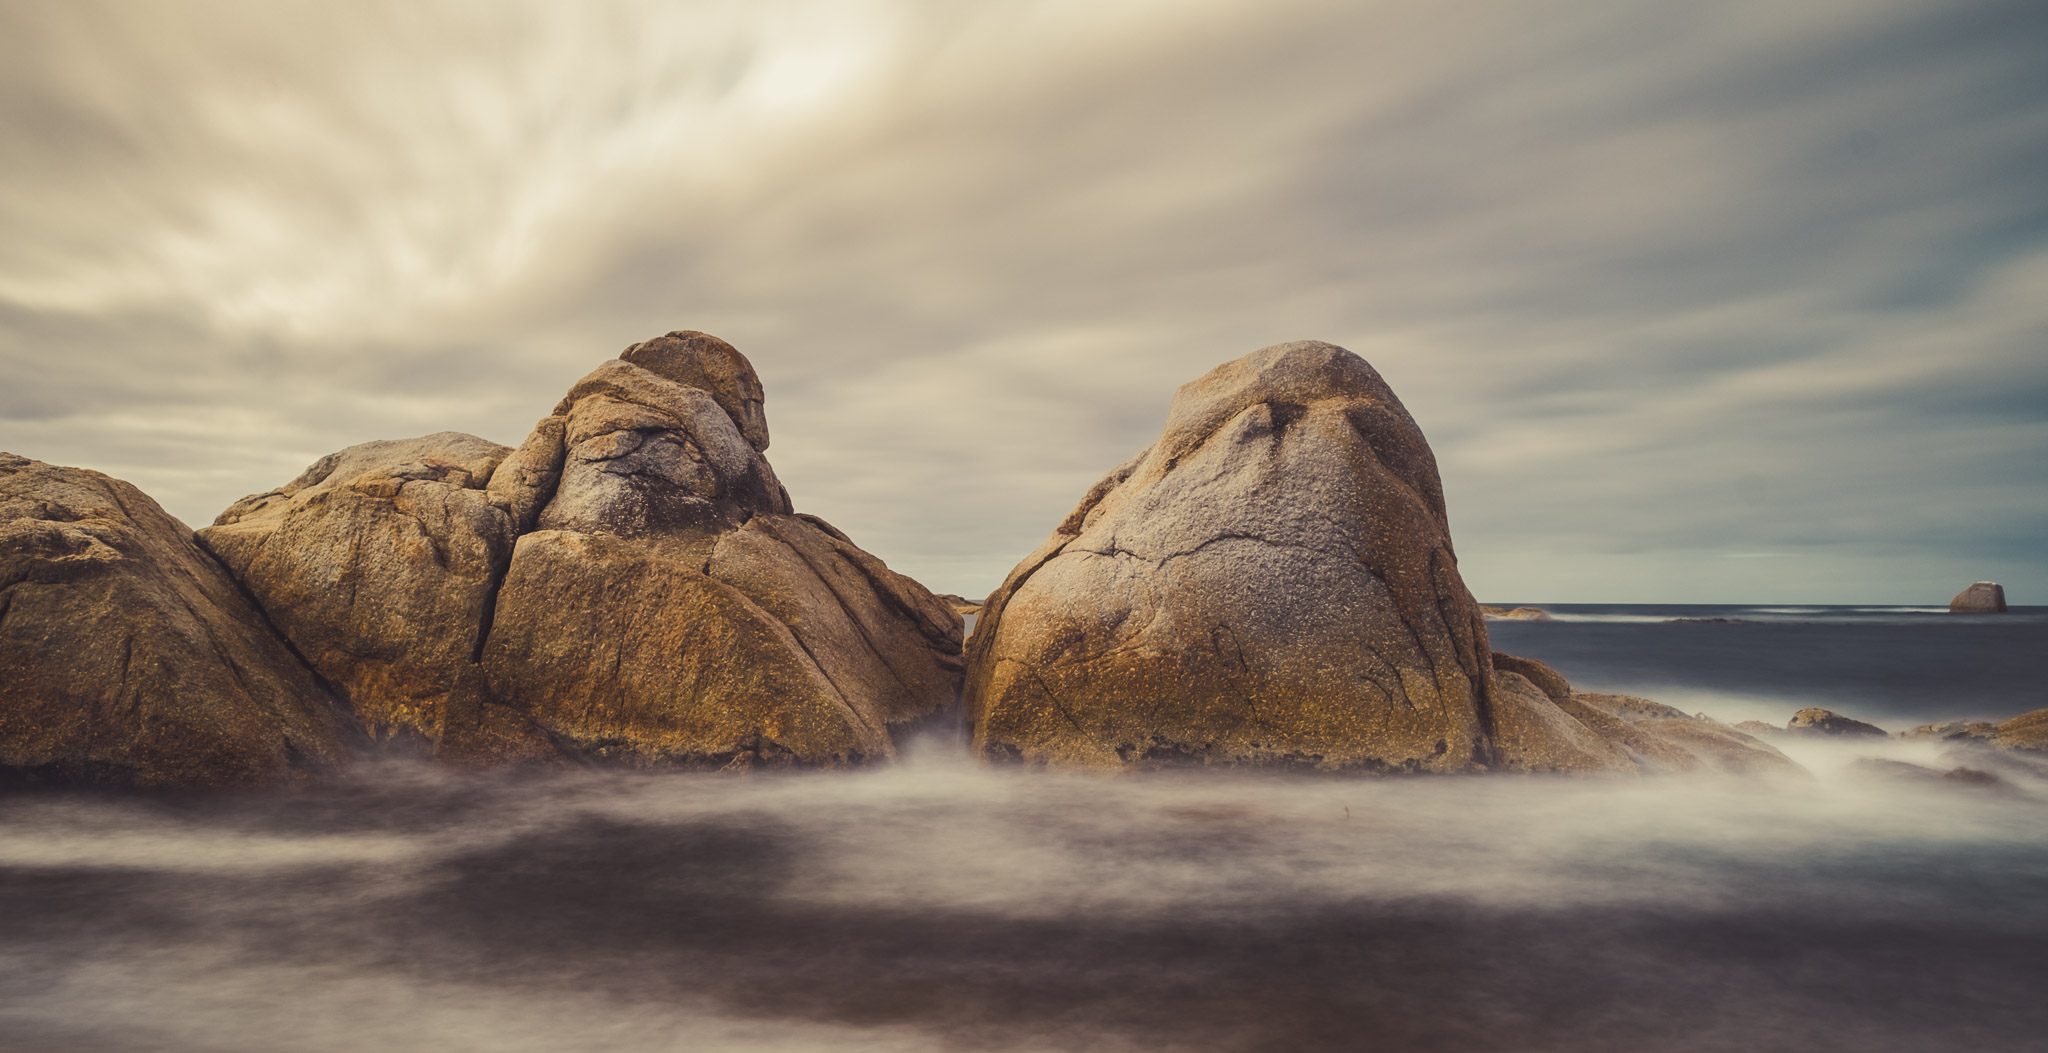 Bicheno Boulders